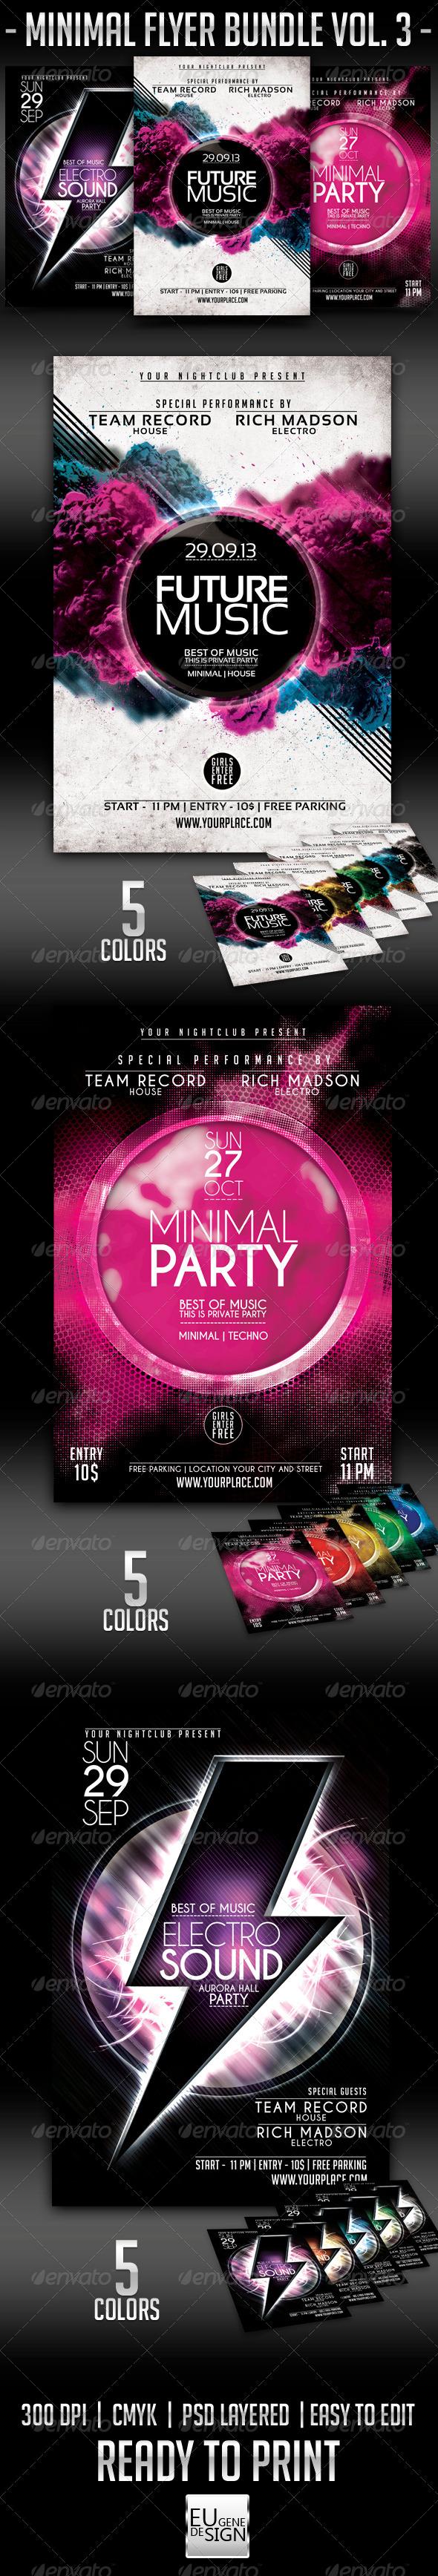 Minimal Flyer Bundle Vol.3 - Clubs & Parties Events